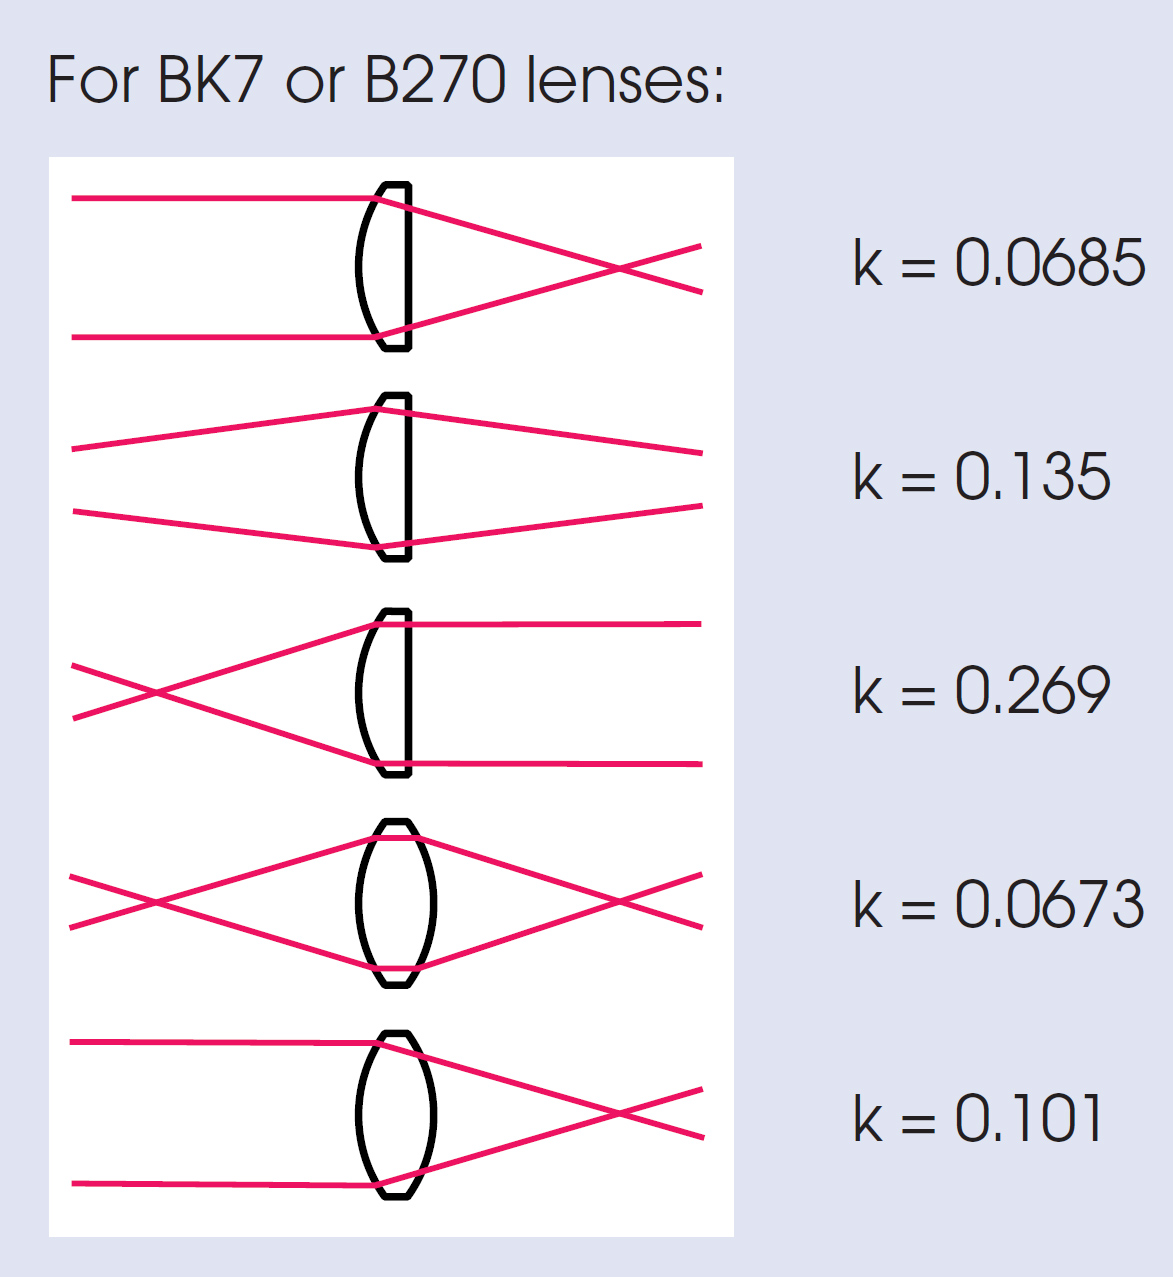 Singlet spherical aber quality planoconvex lenses simple convex lenses lenses comar